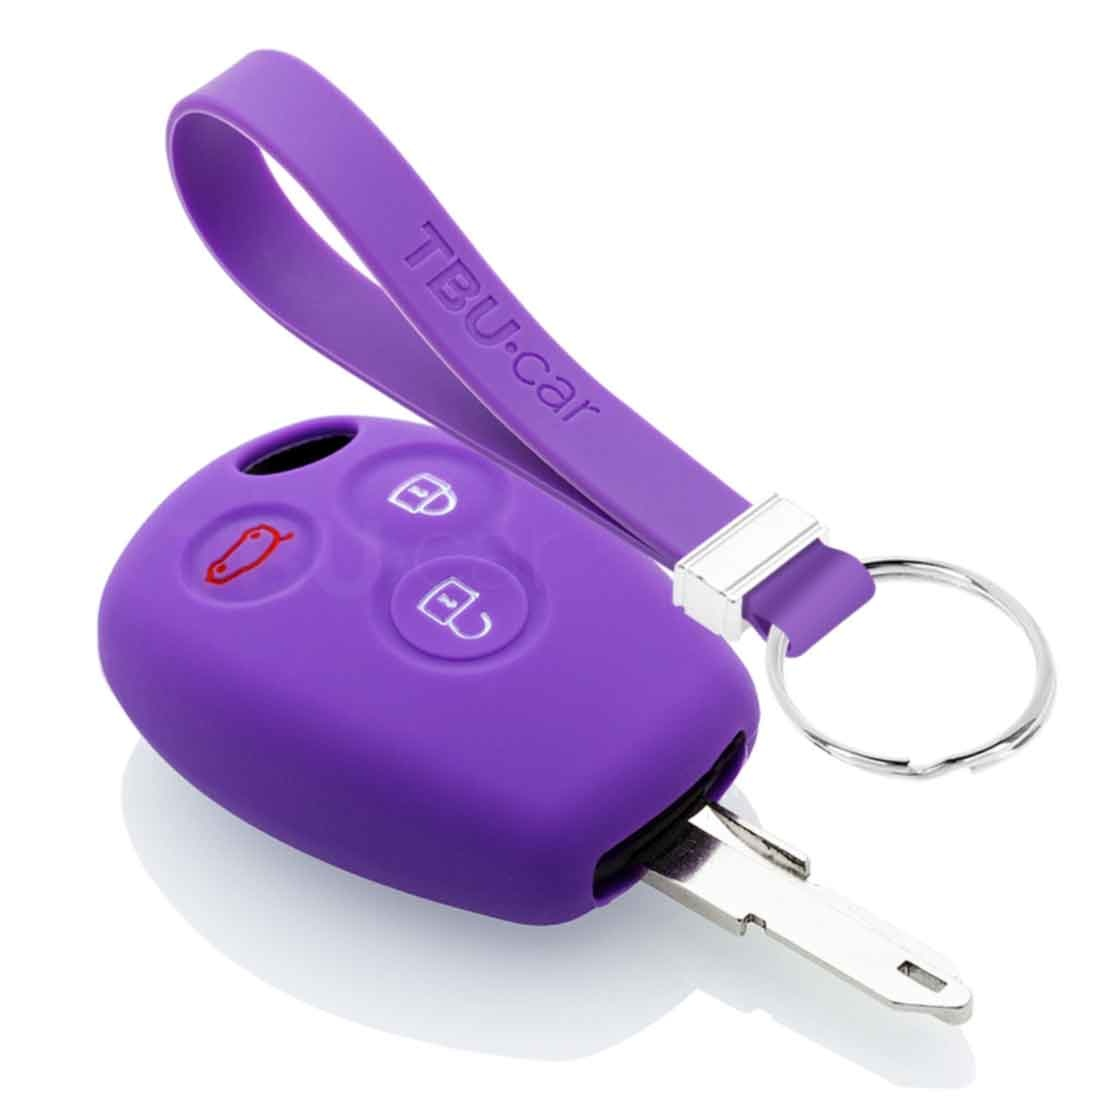 TBU car TBU car Sleutel cover compatibel met Dacia - Silicone sleutelhoesje - beschermhoesje autosleutel - Paars